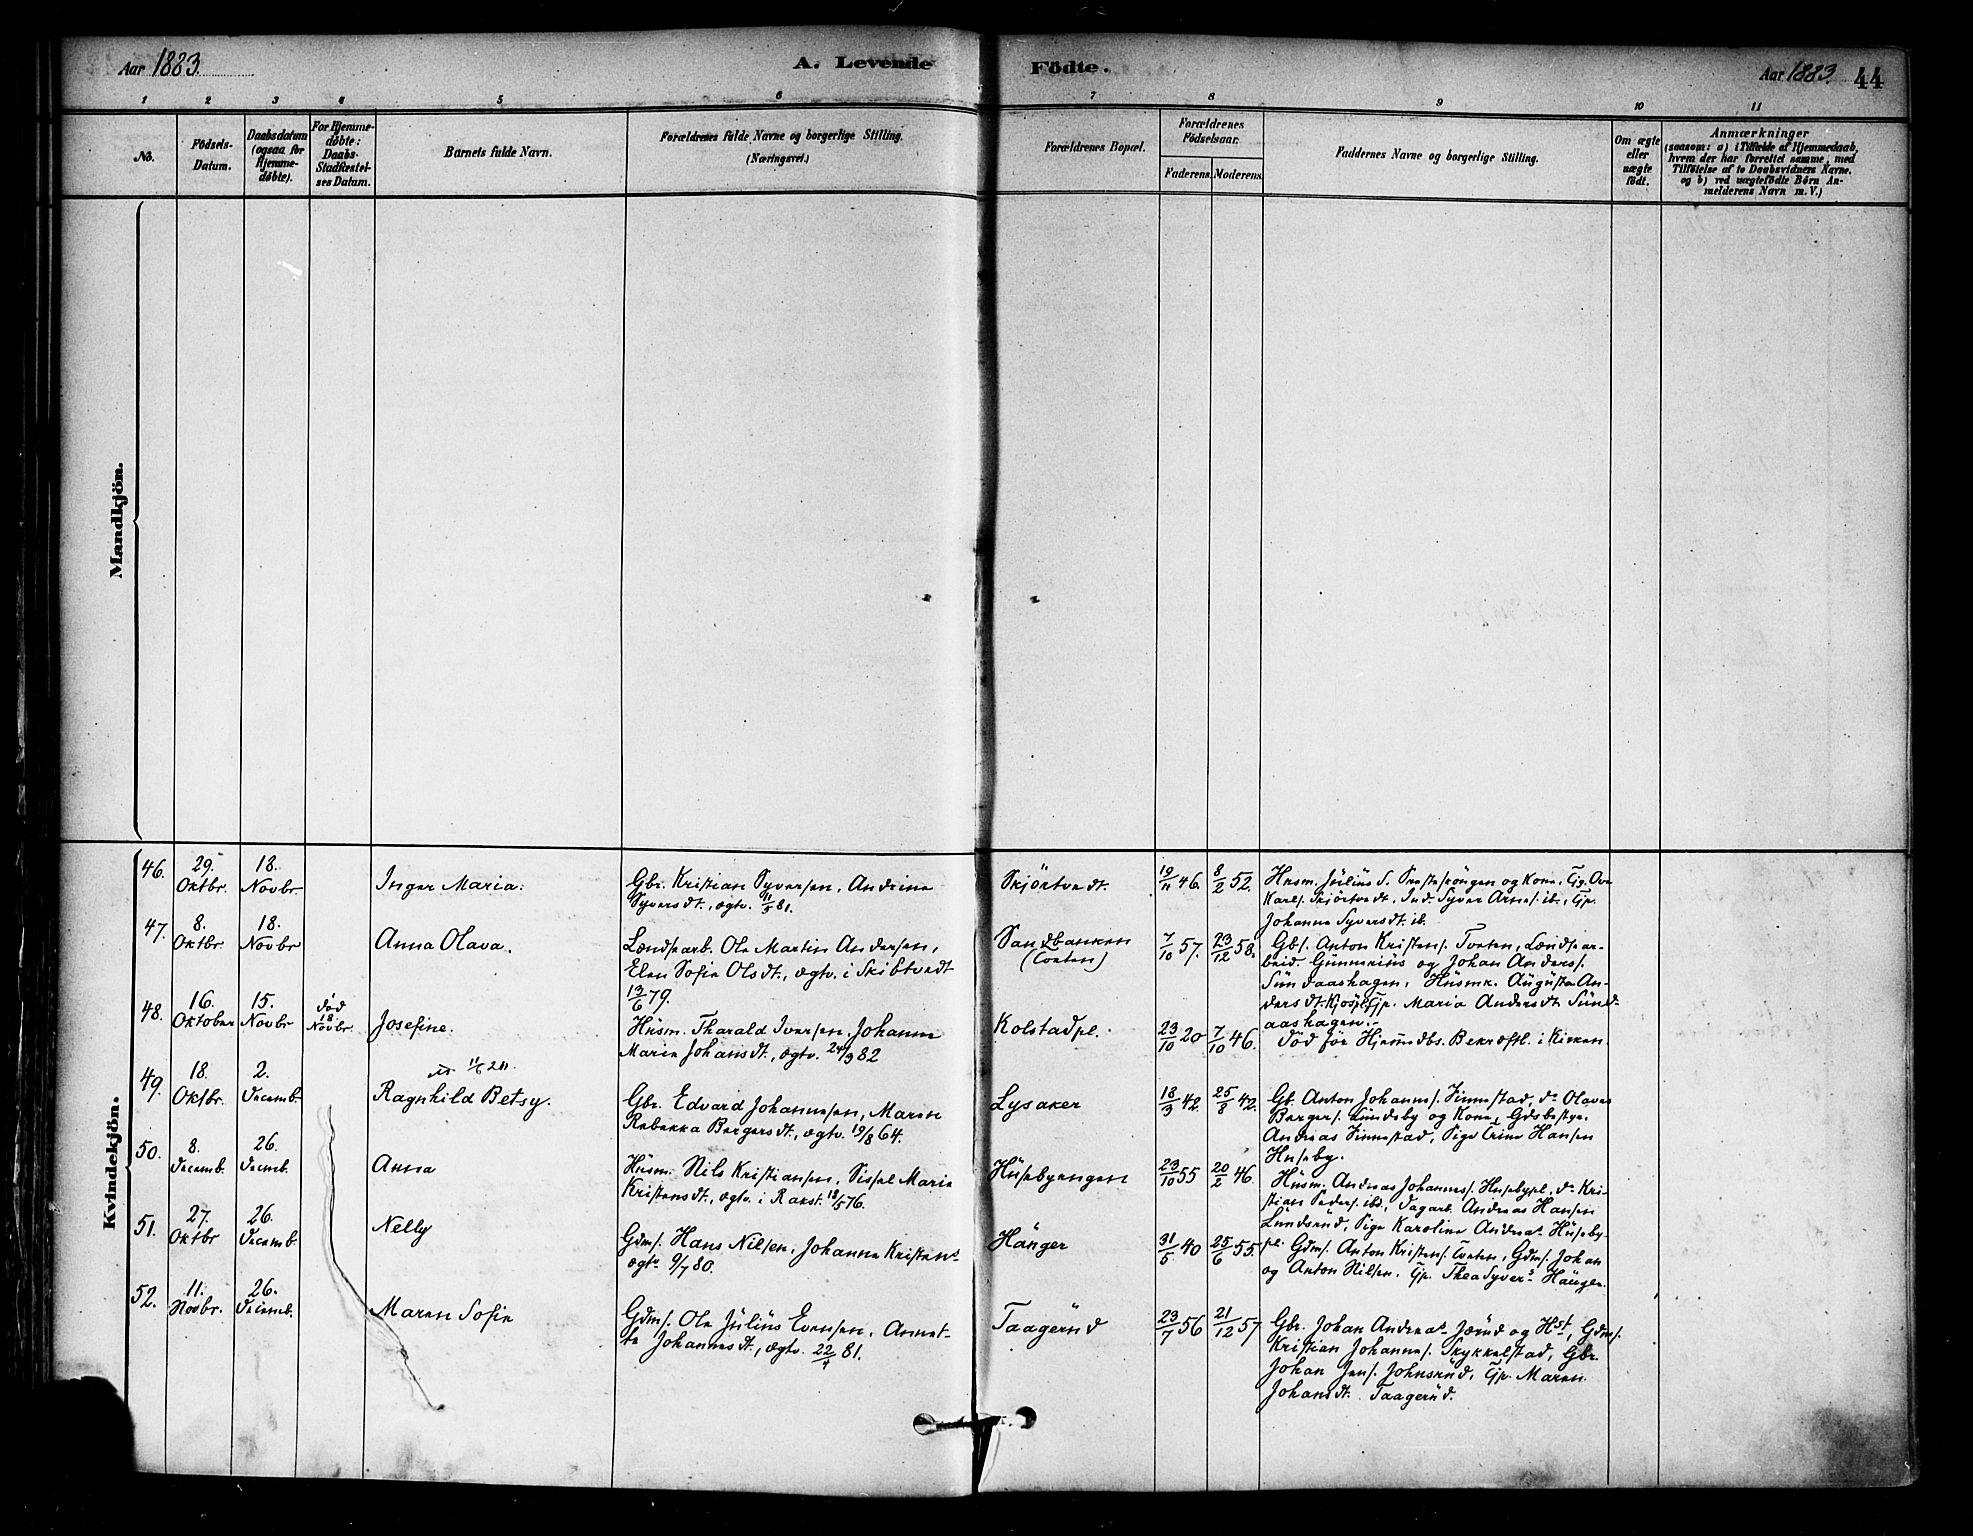 SAO, Eidsberg prestekontor Kirkebøker, F/Fa/L0012: Ministerialbok nr. I 12, 1879-1901, s. 44